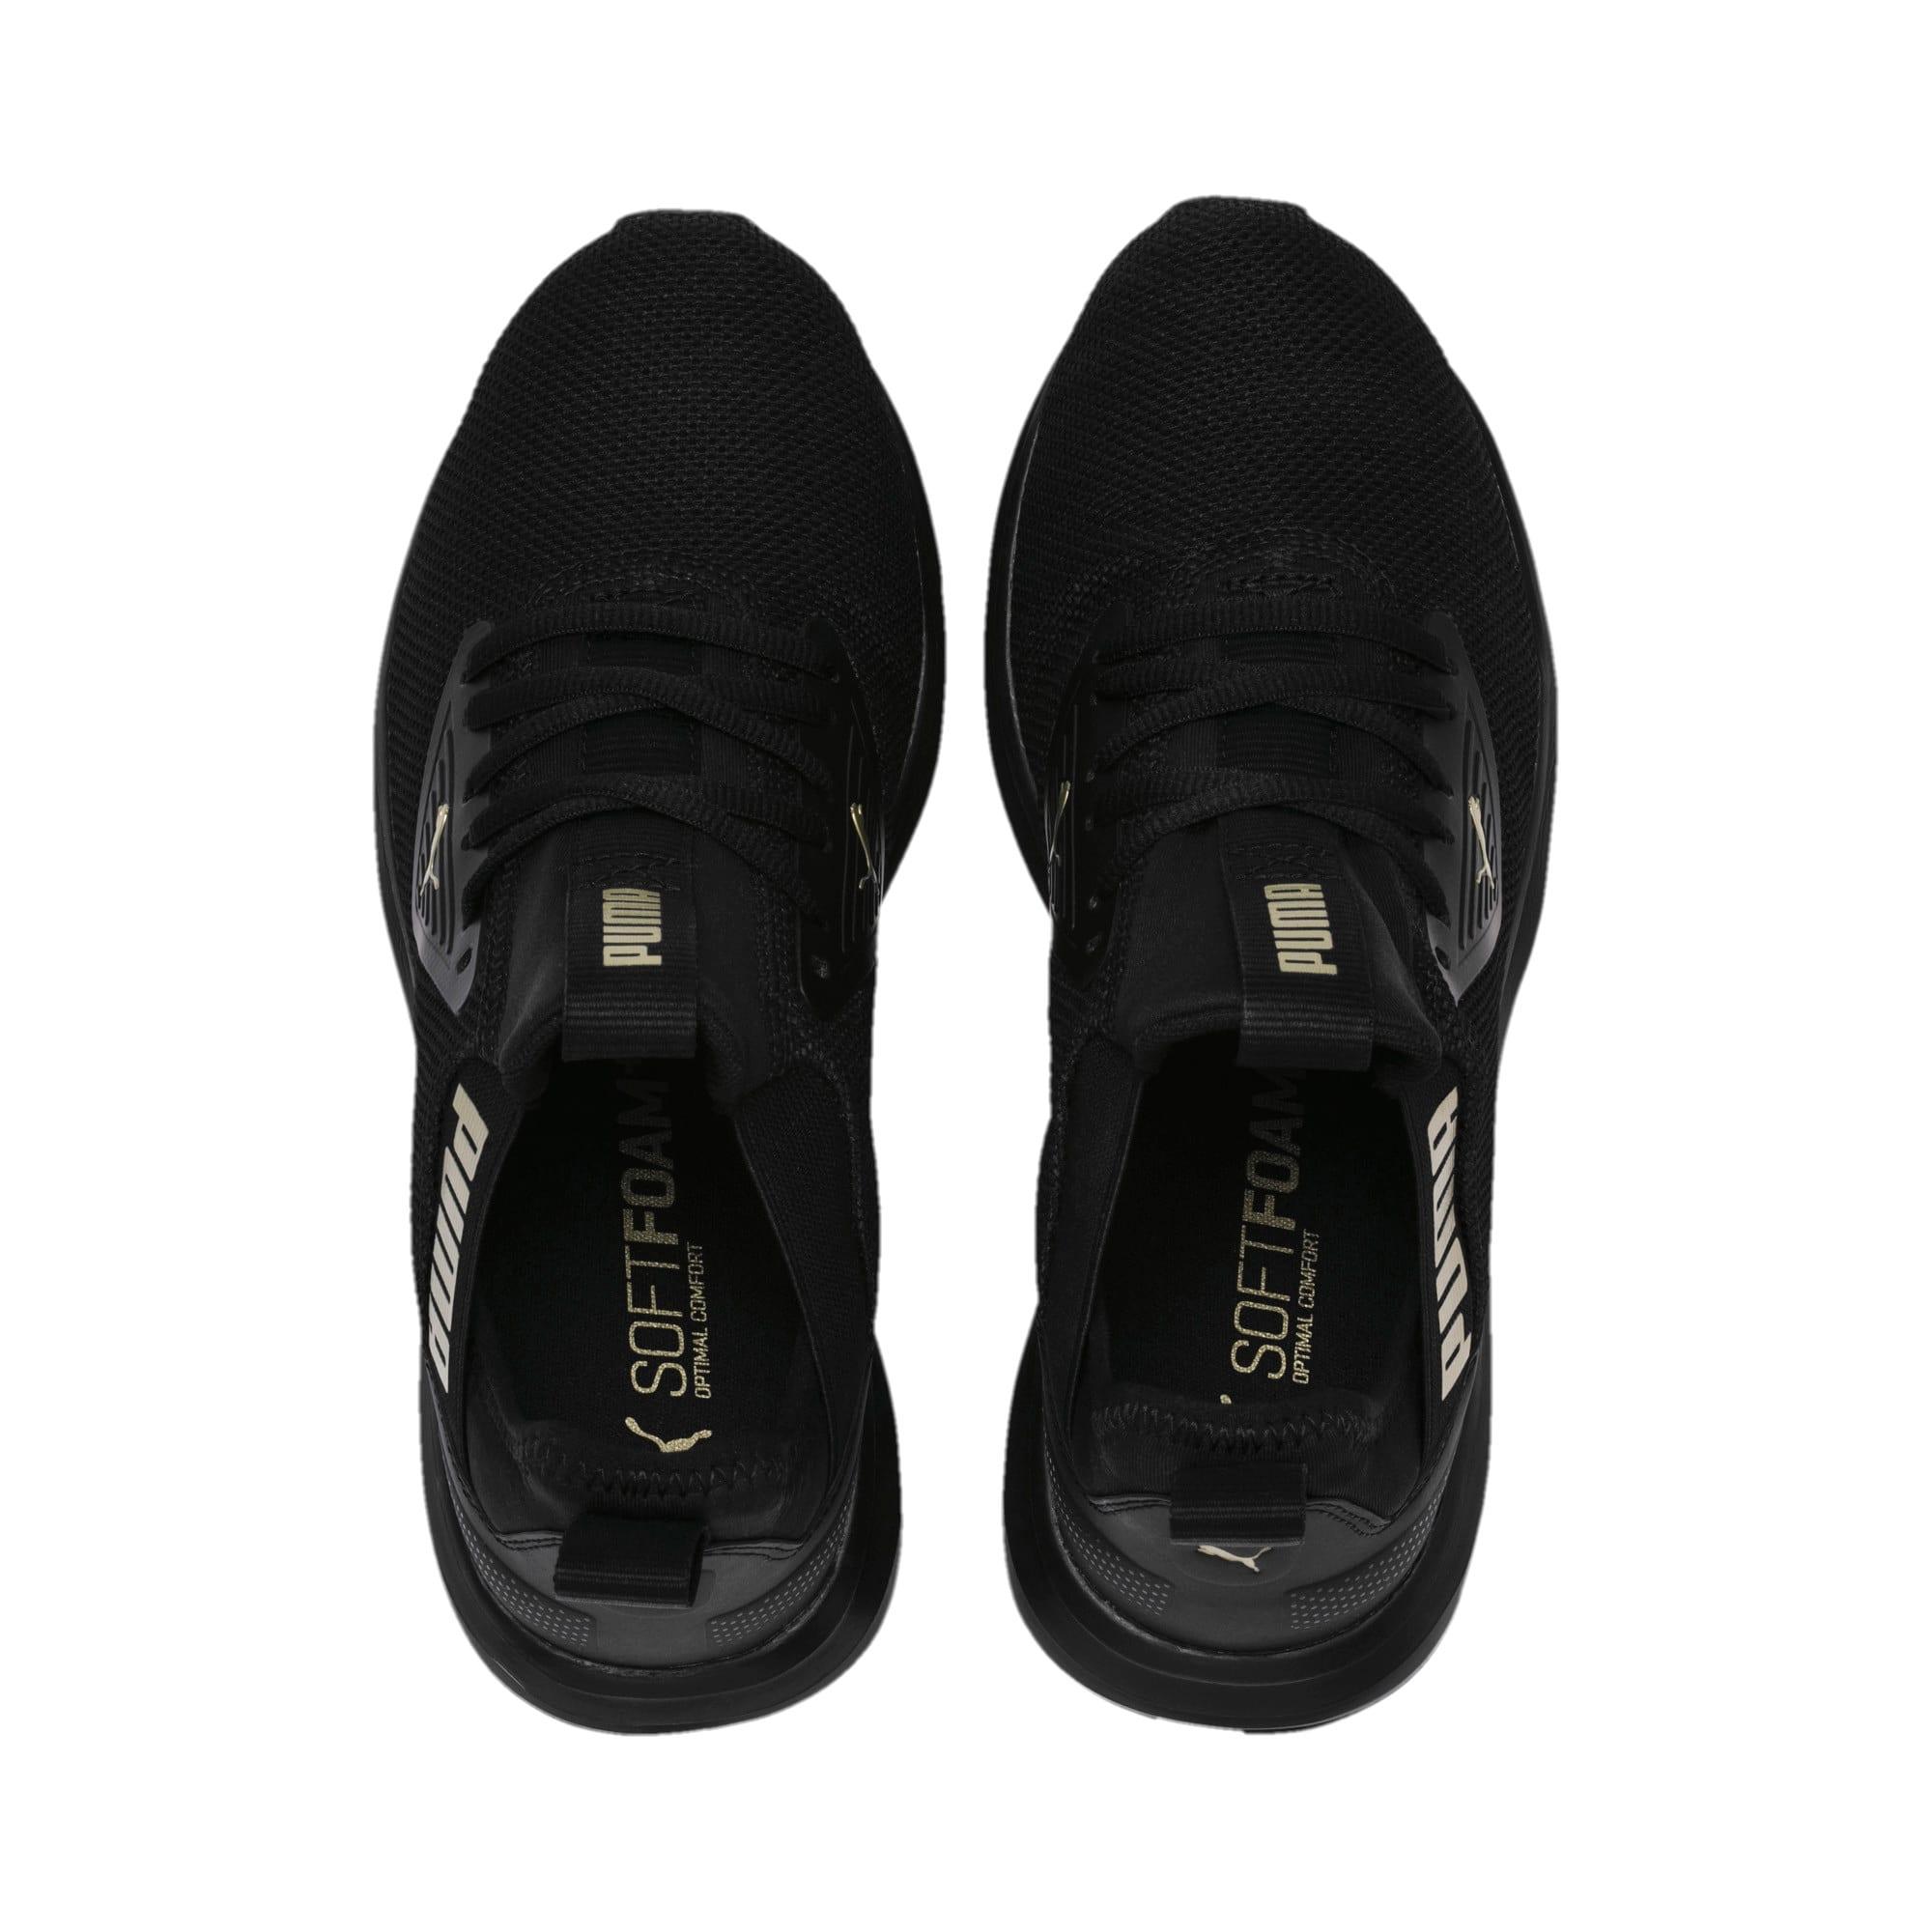 Thumbnail 6 of Enzo Beta Women's Training Shoes, Puma Black-Metallic Gold, medium